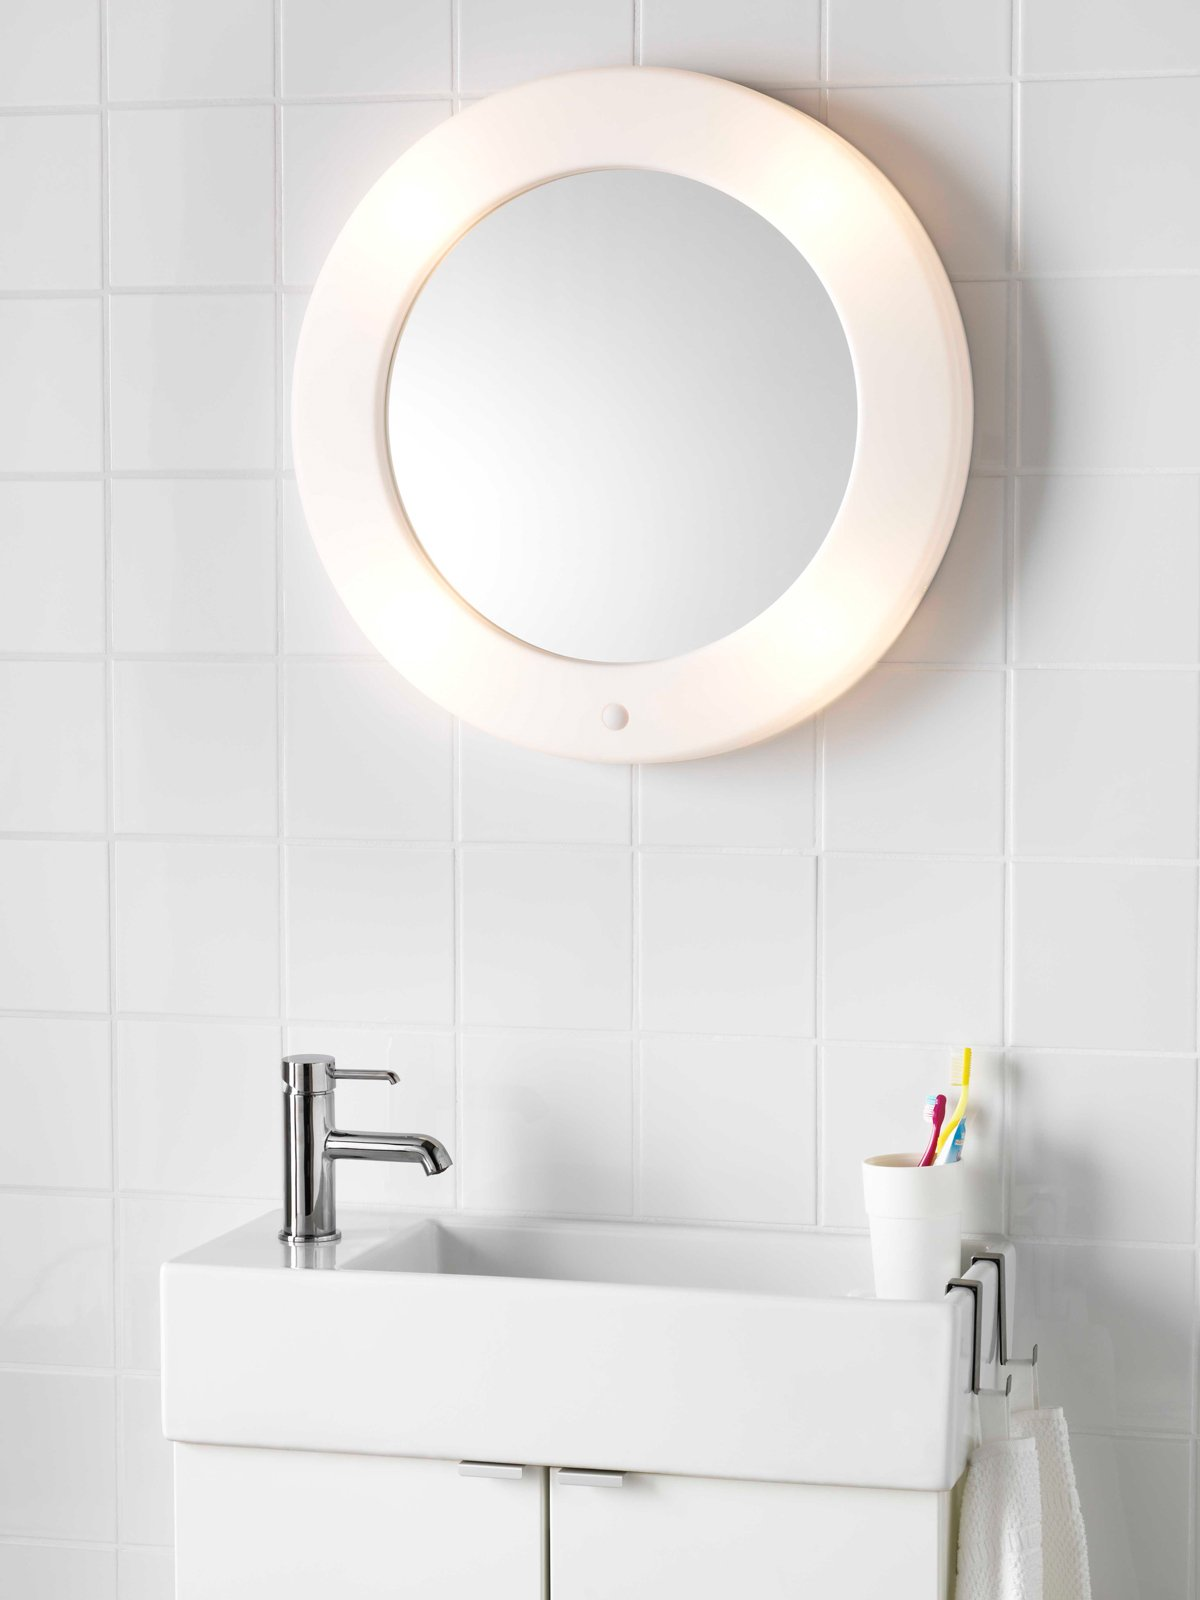 Illuminazione Ikea Bagno: Lampade ikea bagno aiuto ...